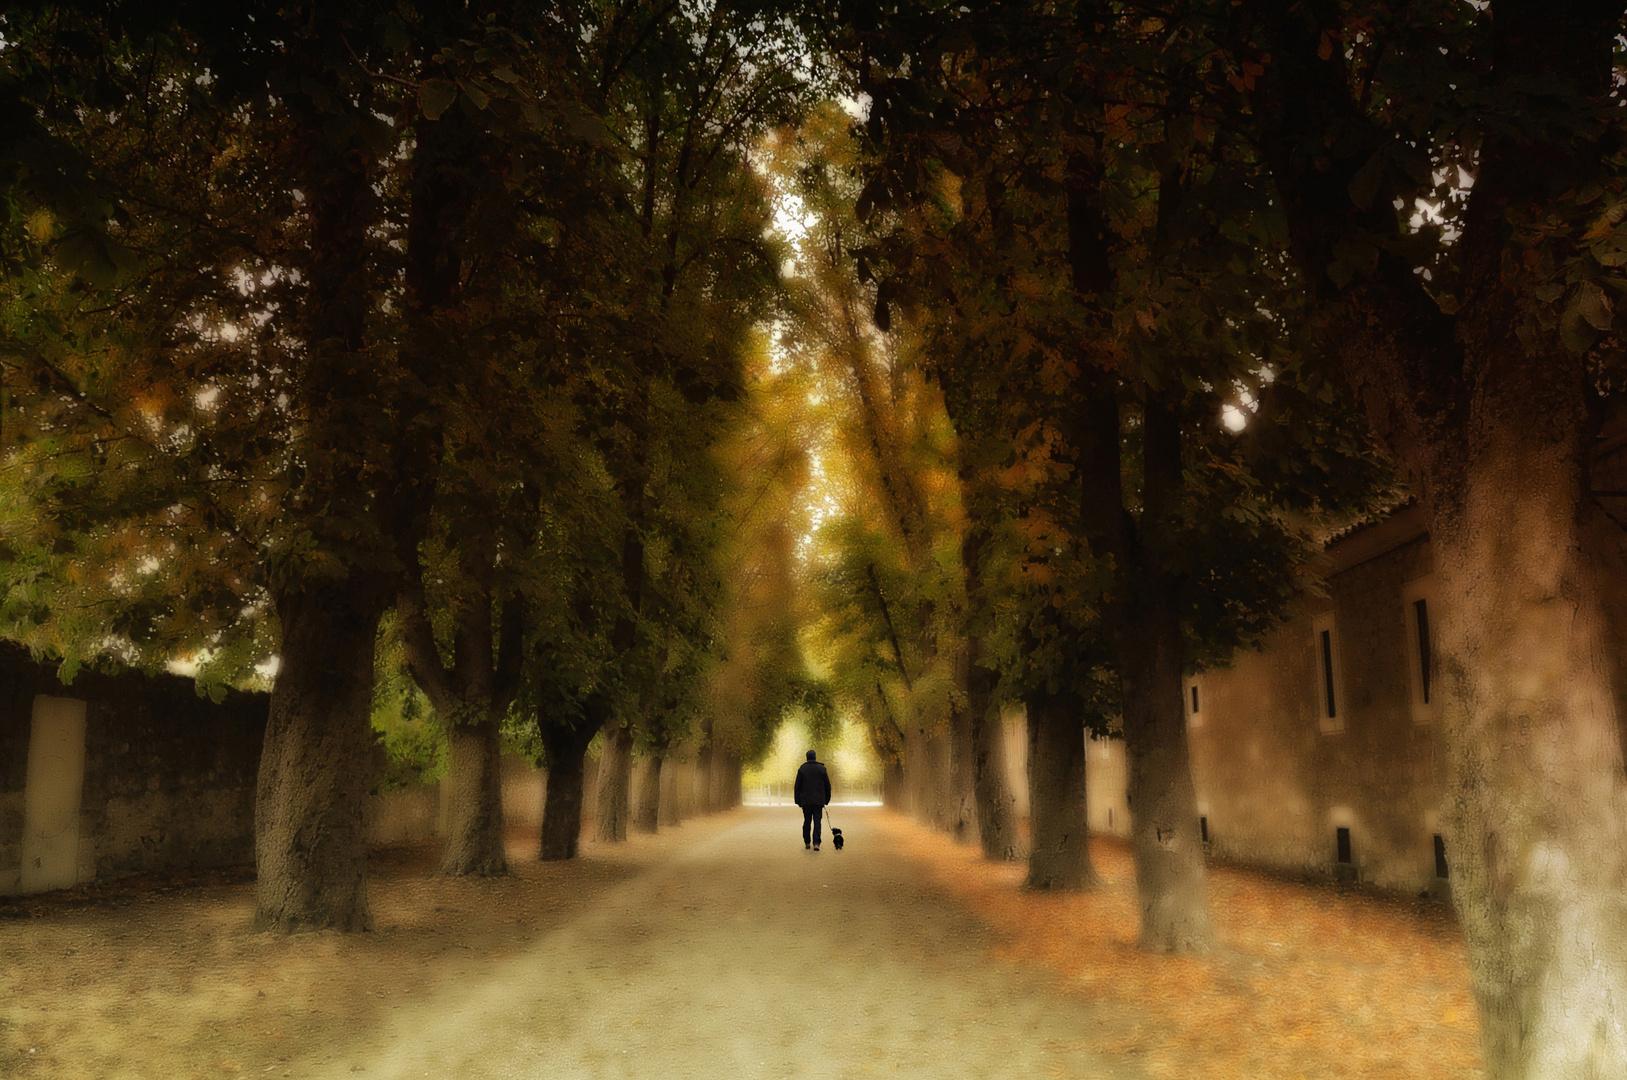 Alma solitaria